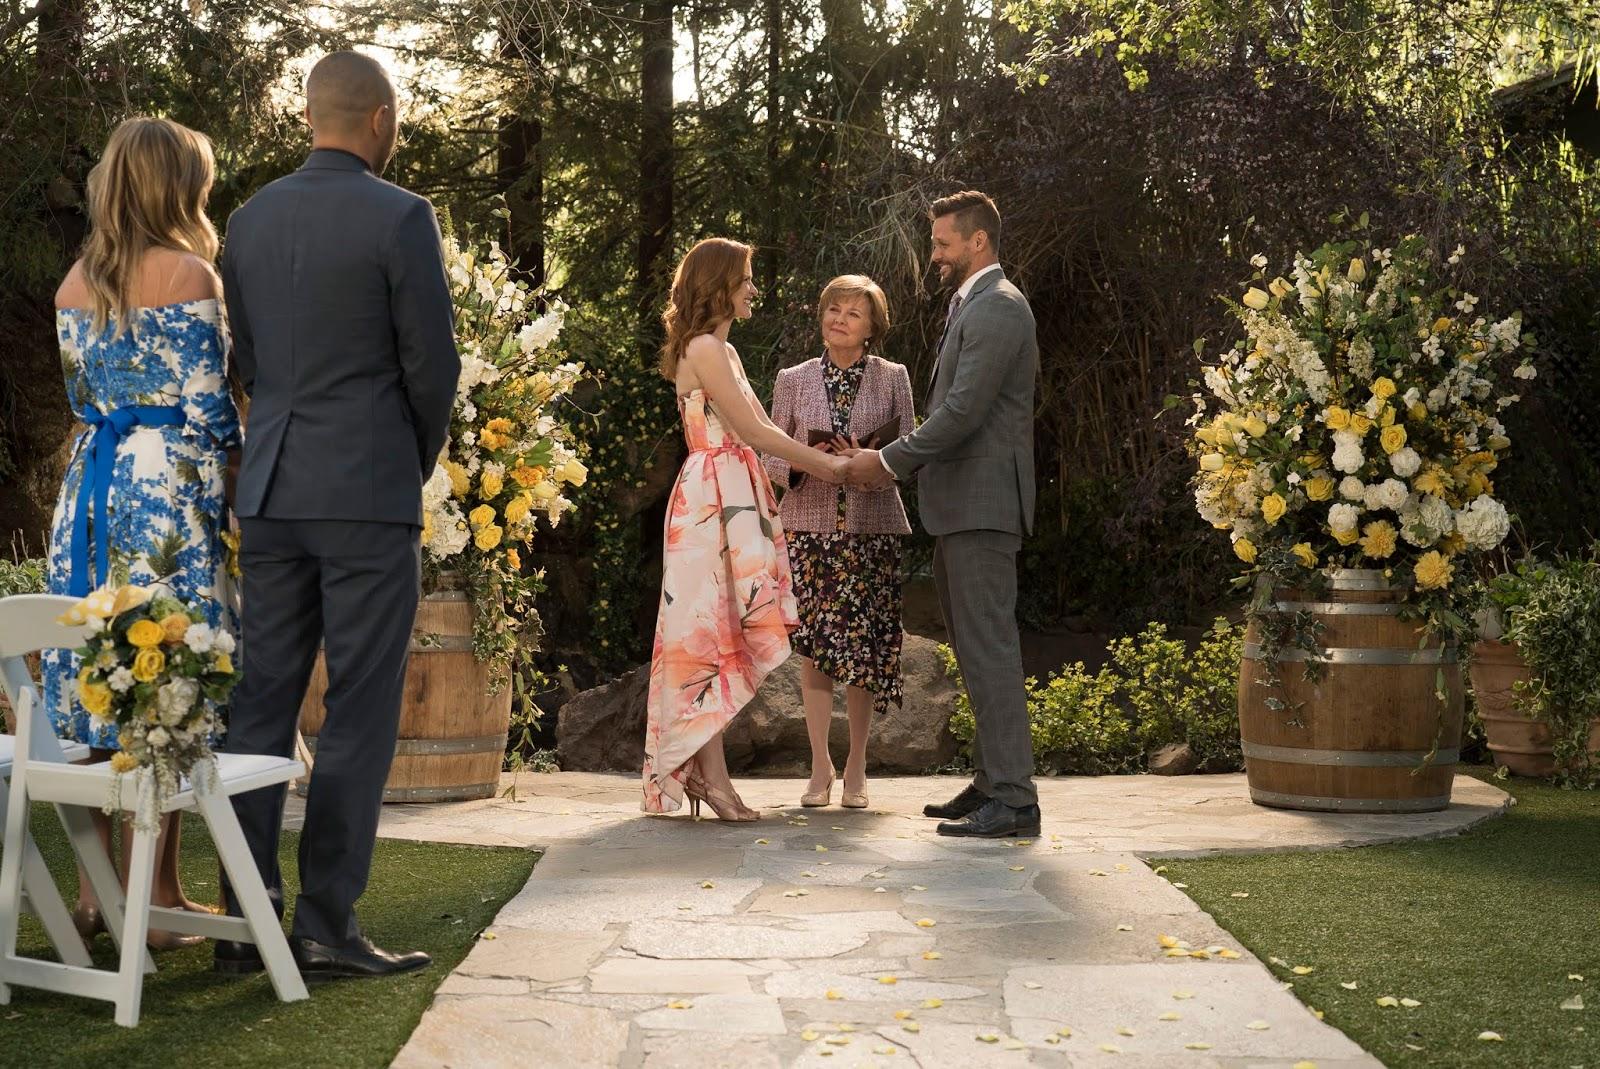 Grey's Anatomy 14x24 All of Me April Matthew